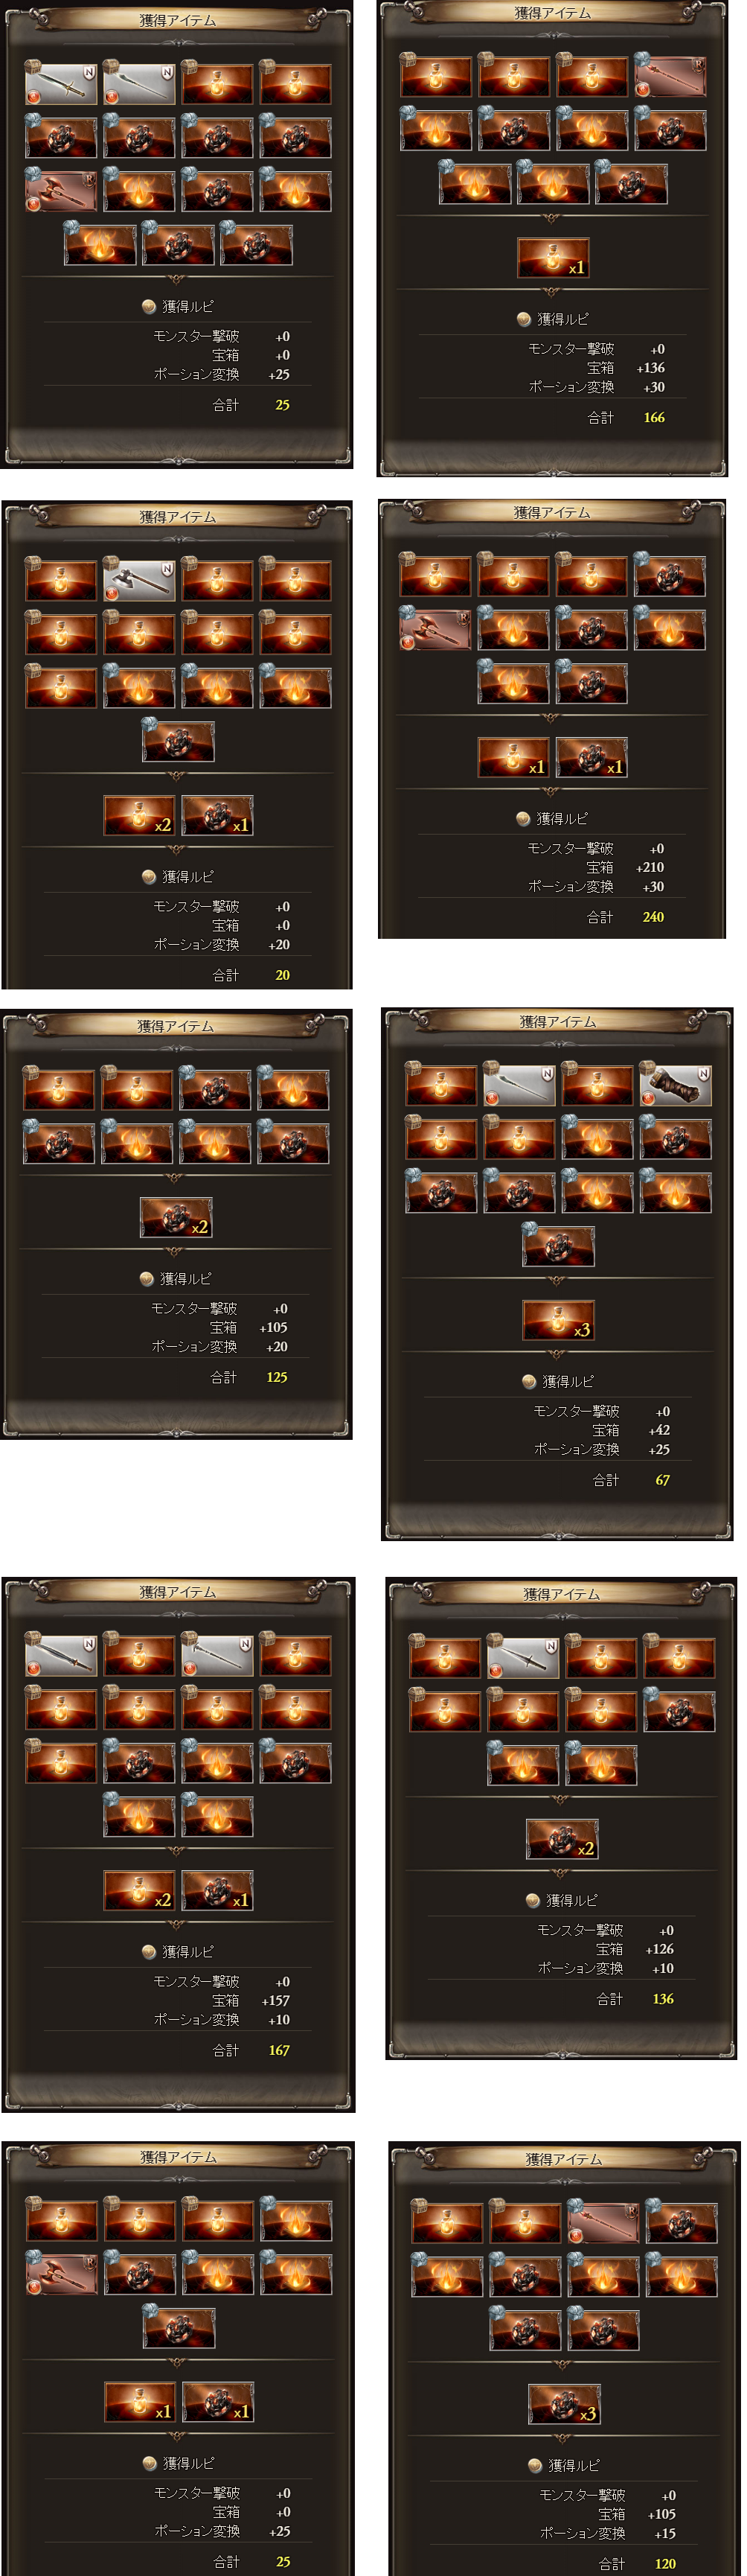 20160814-2